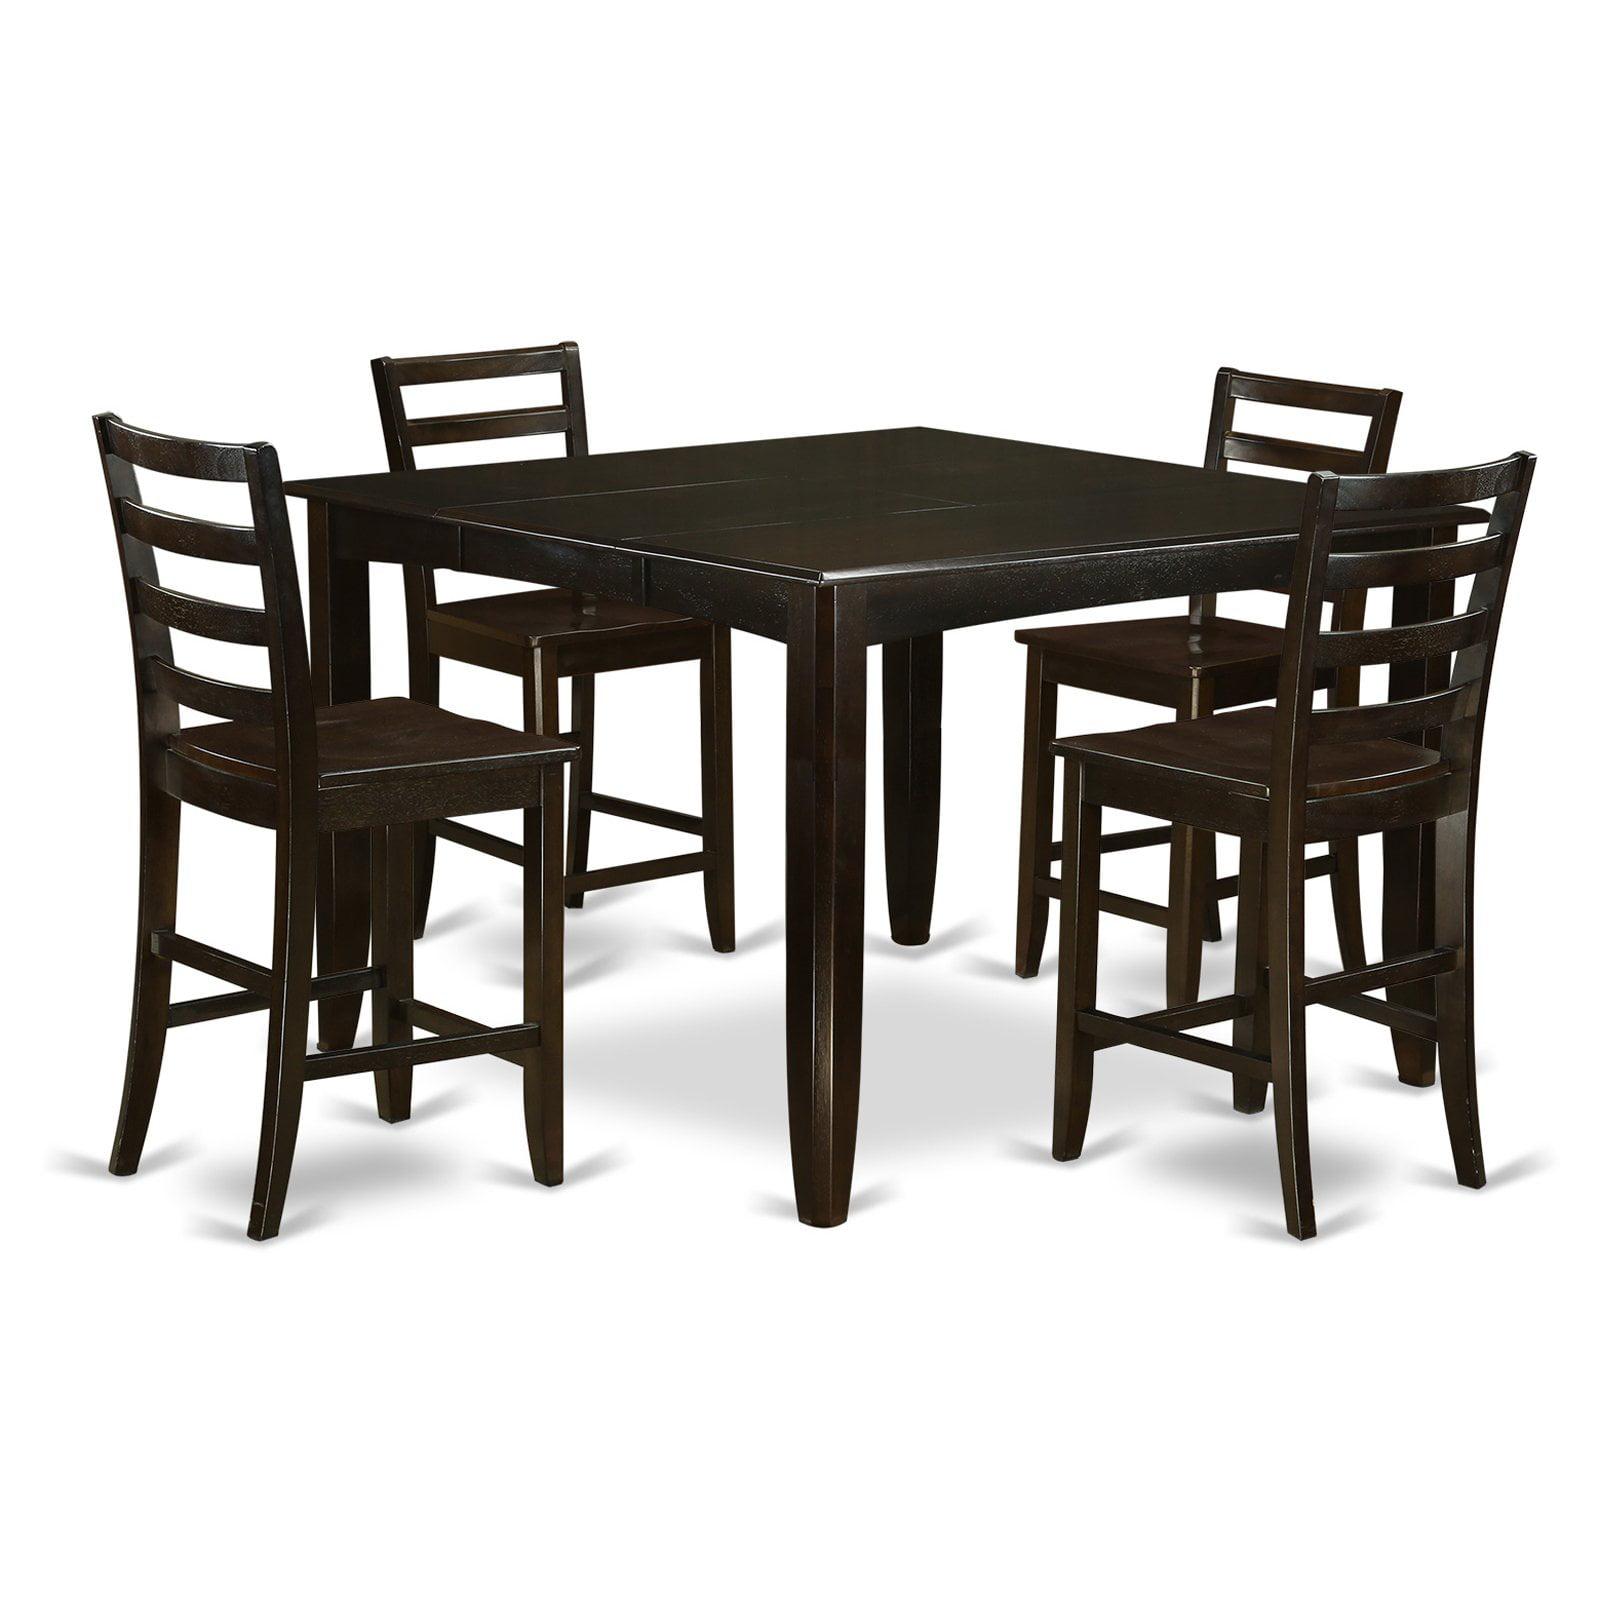 East West Furniture Fairwinds 5 Piece Ladder Back Dining Table Set